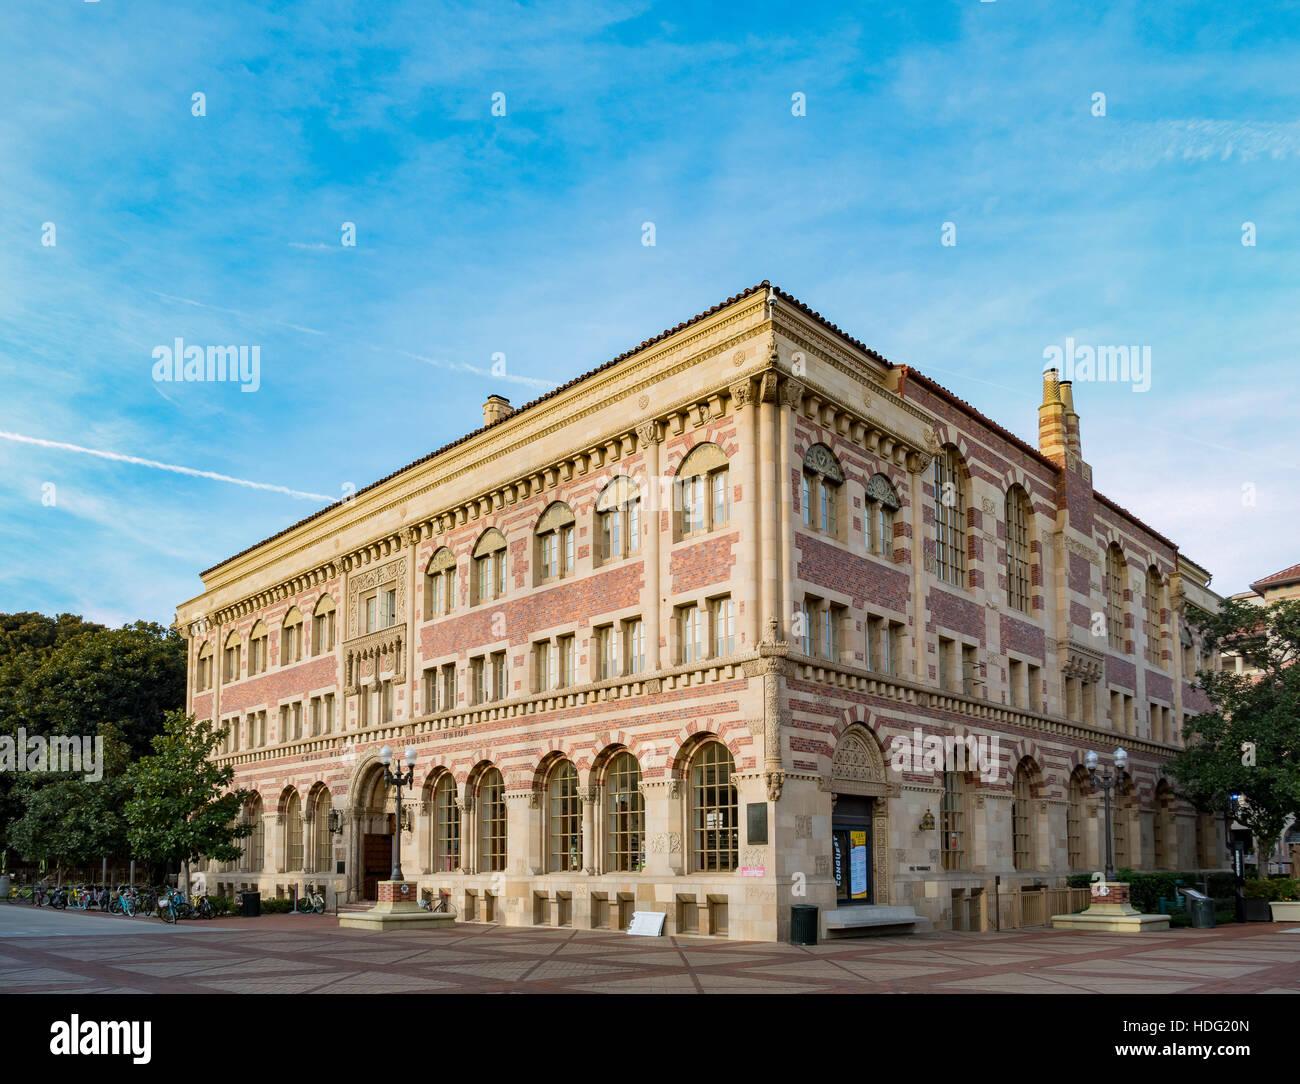 University Of Southern California Usc Stock Photos & University Of ...